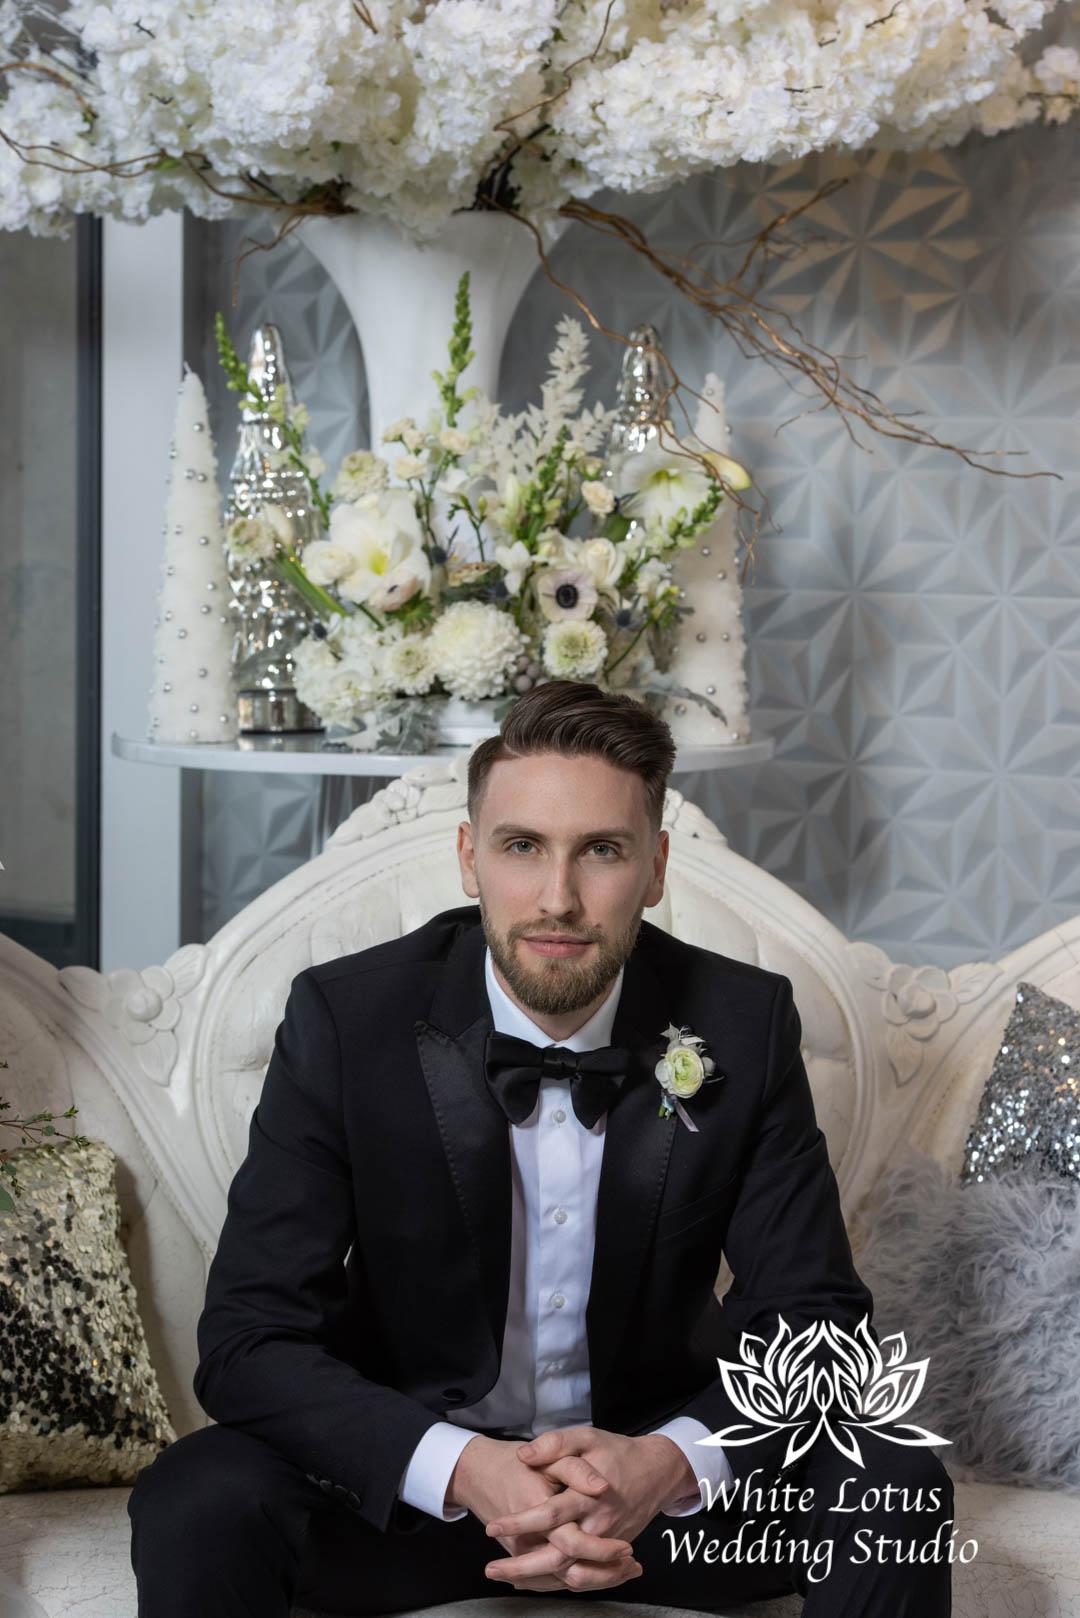 070- GLAM WINTERLUXE WEDDING INSPIRATION